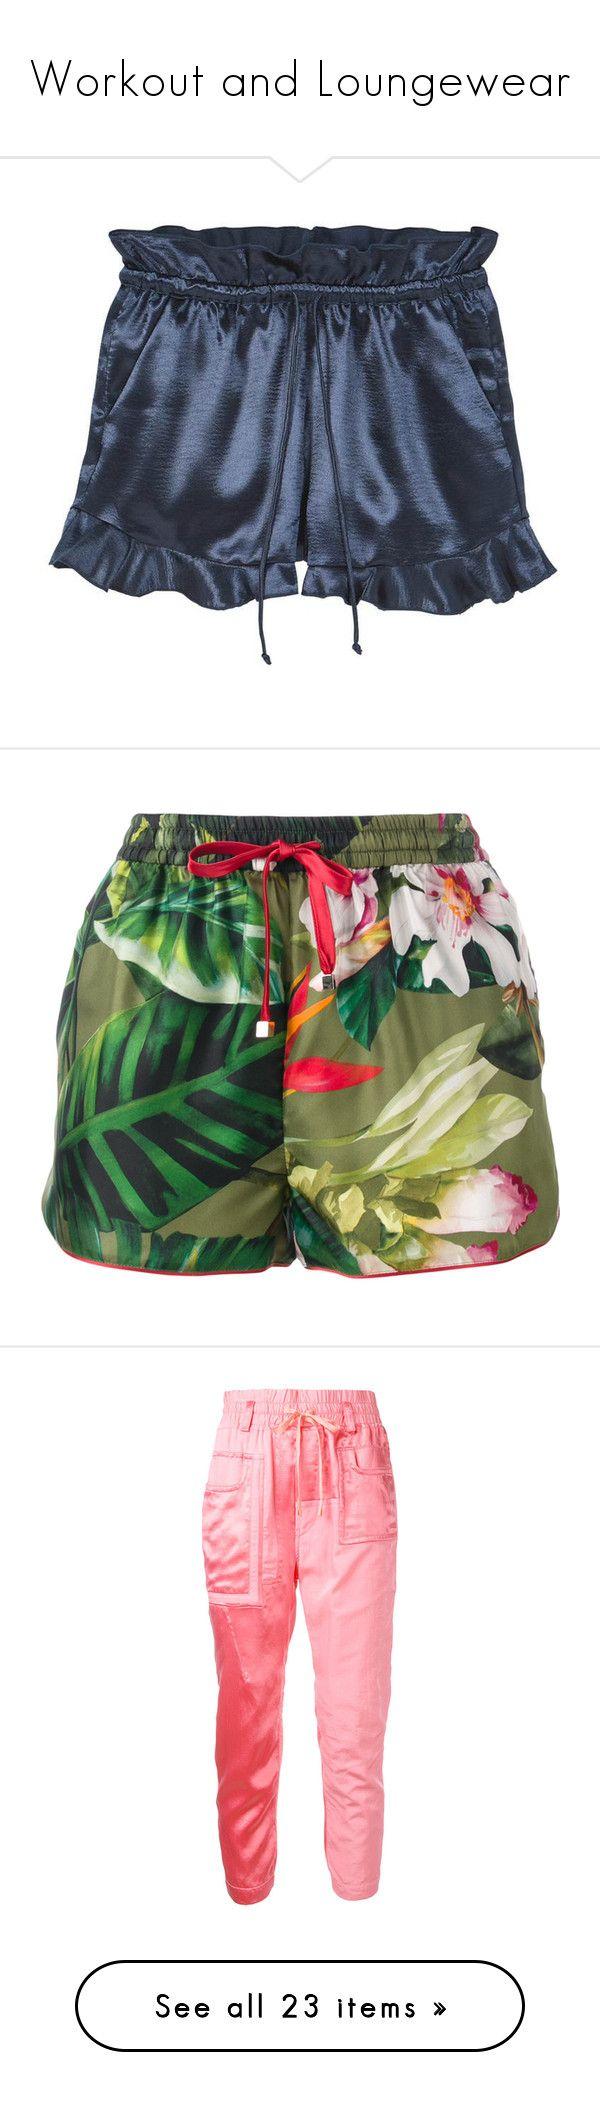 """Workout and Loungewear"" by amyfernandez010 ❤ liked on Polyvore featuring shorts, drawstring shorts, satin shorts, mango shorts, elastic waistband shorts, ruffle shorts, bottoms, green, floral shorts and floral print shorts"